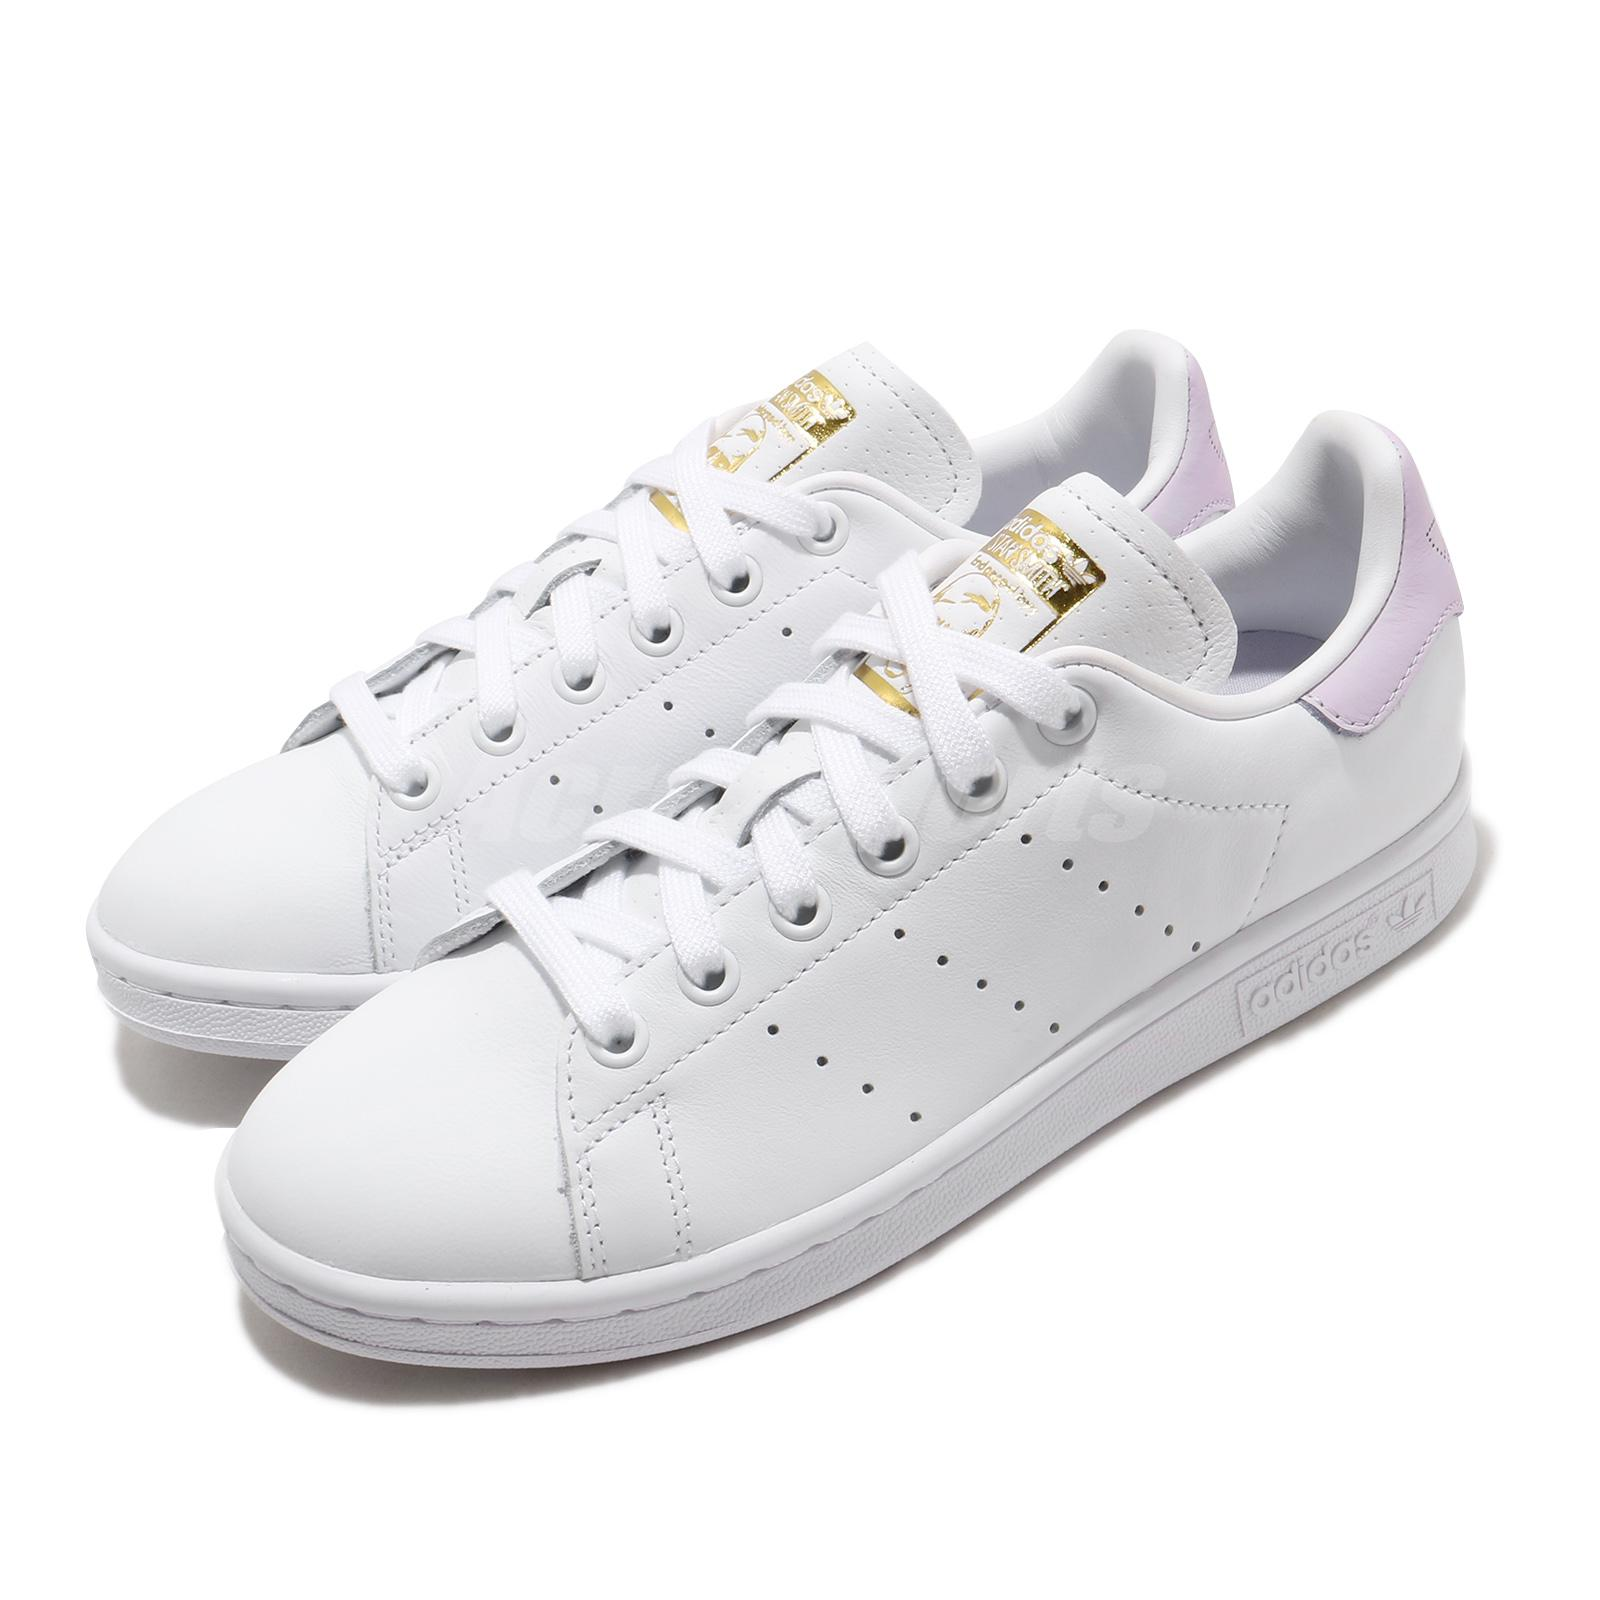 adidas Originals Stan Smith W White